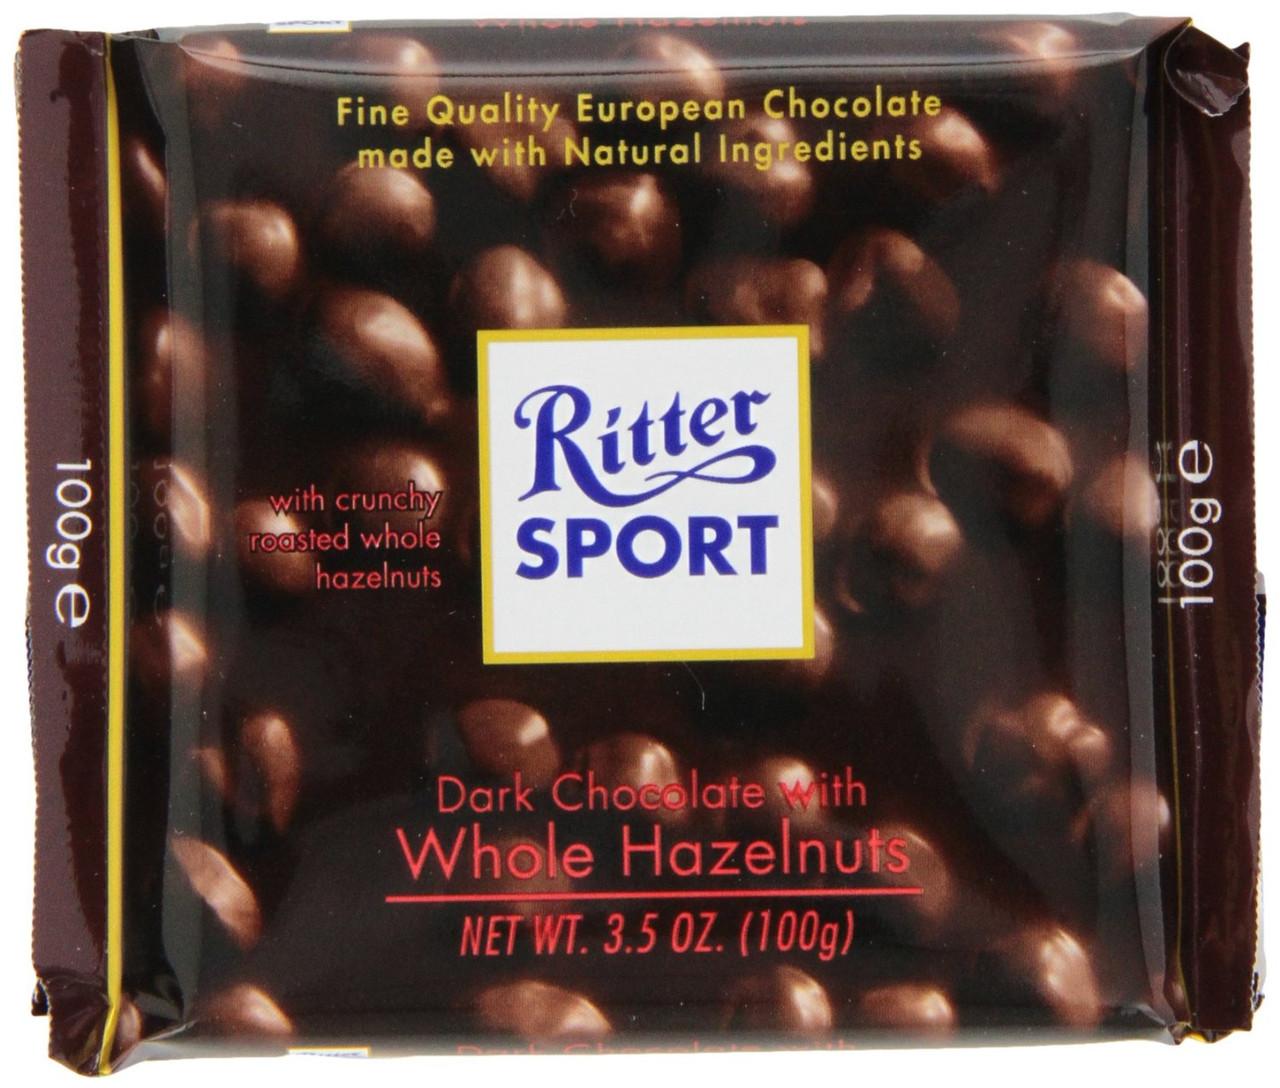 Шоколад Ritter Sport Dark Whole Hazelnuts (Риттер Спорт с фундуком), 100 г